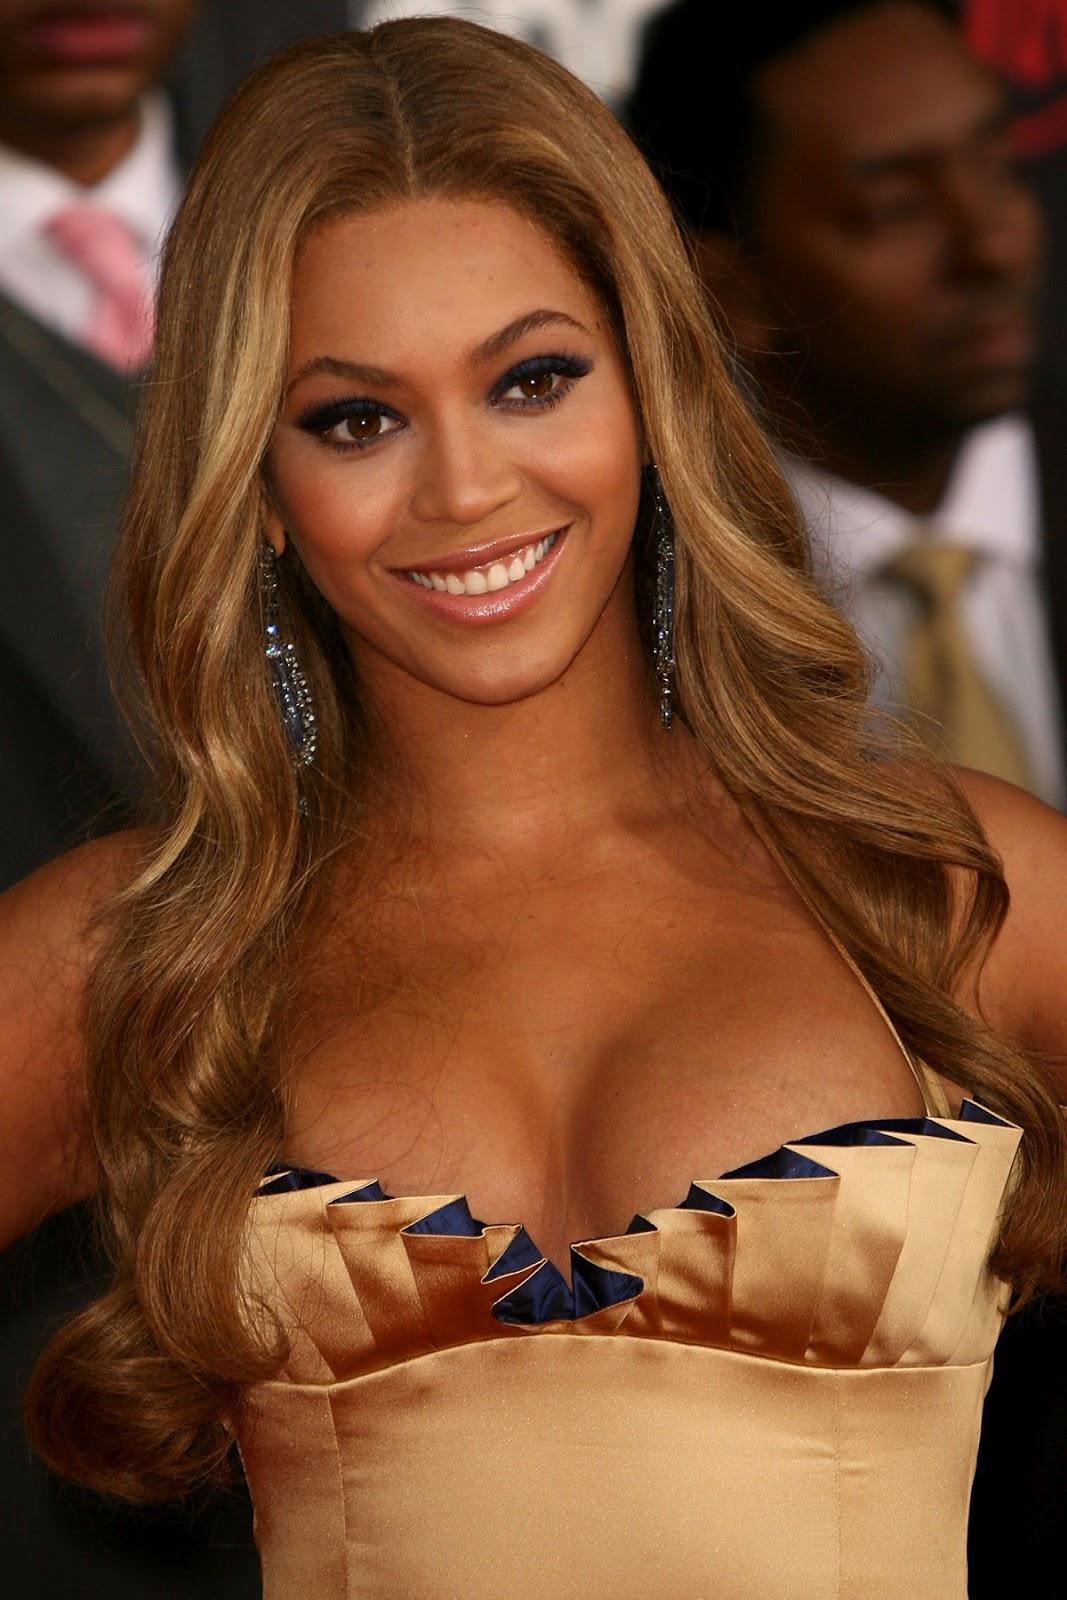 http://4.bp.blogspot.com/-nHxvQtiqwIE/T8sSTqmzyGI/AAAAAAAACZ8/ODzx5S0gHLA/s1600/Beyonce-hot-picture-piccol+(18).jpg